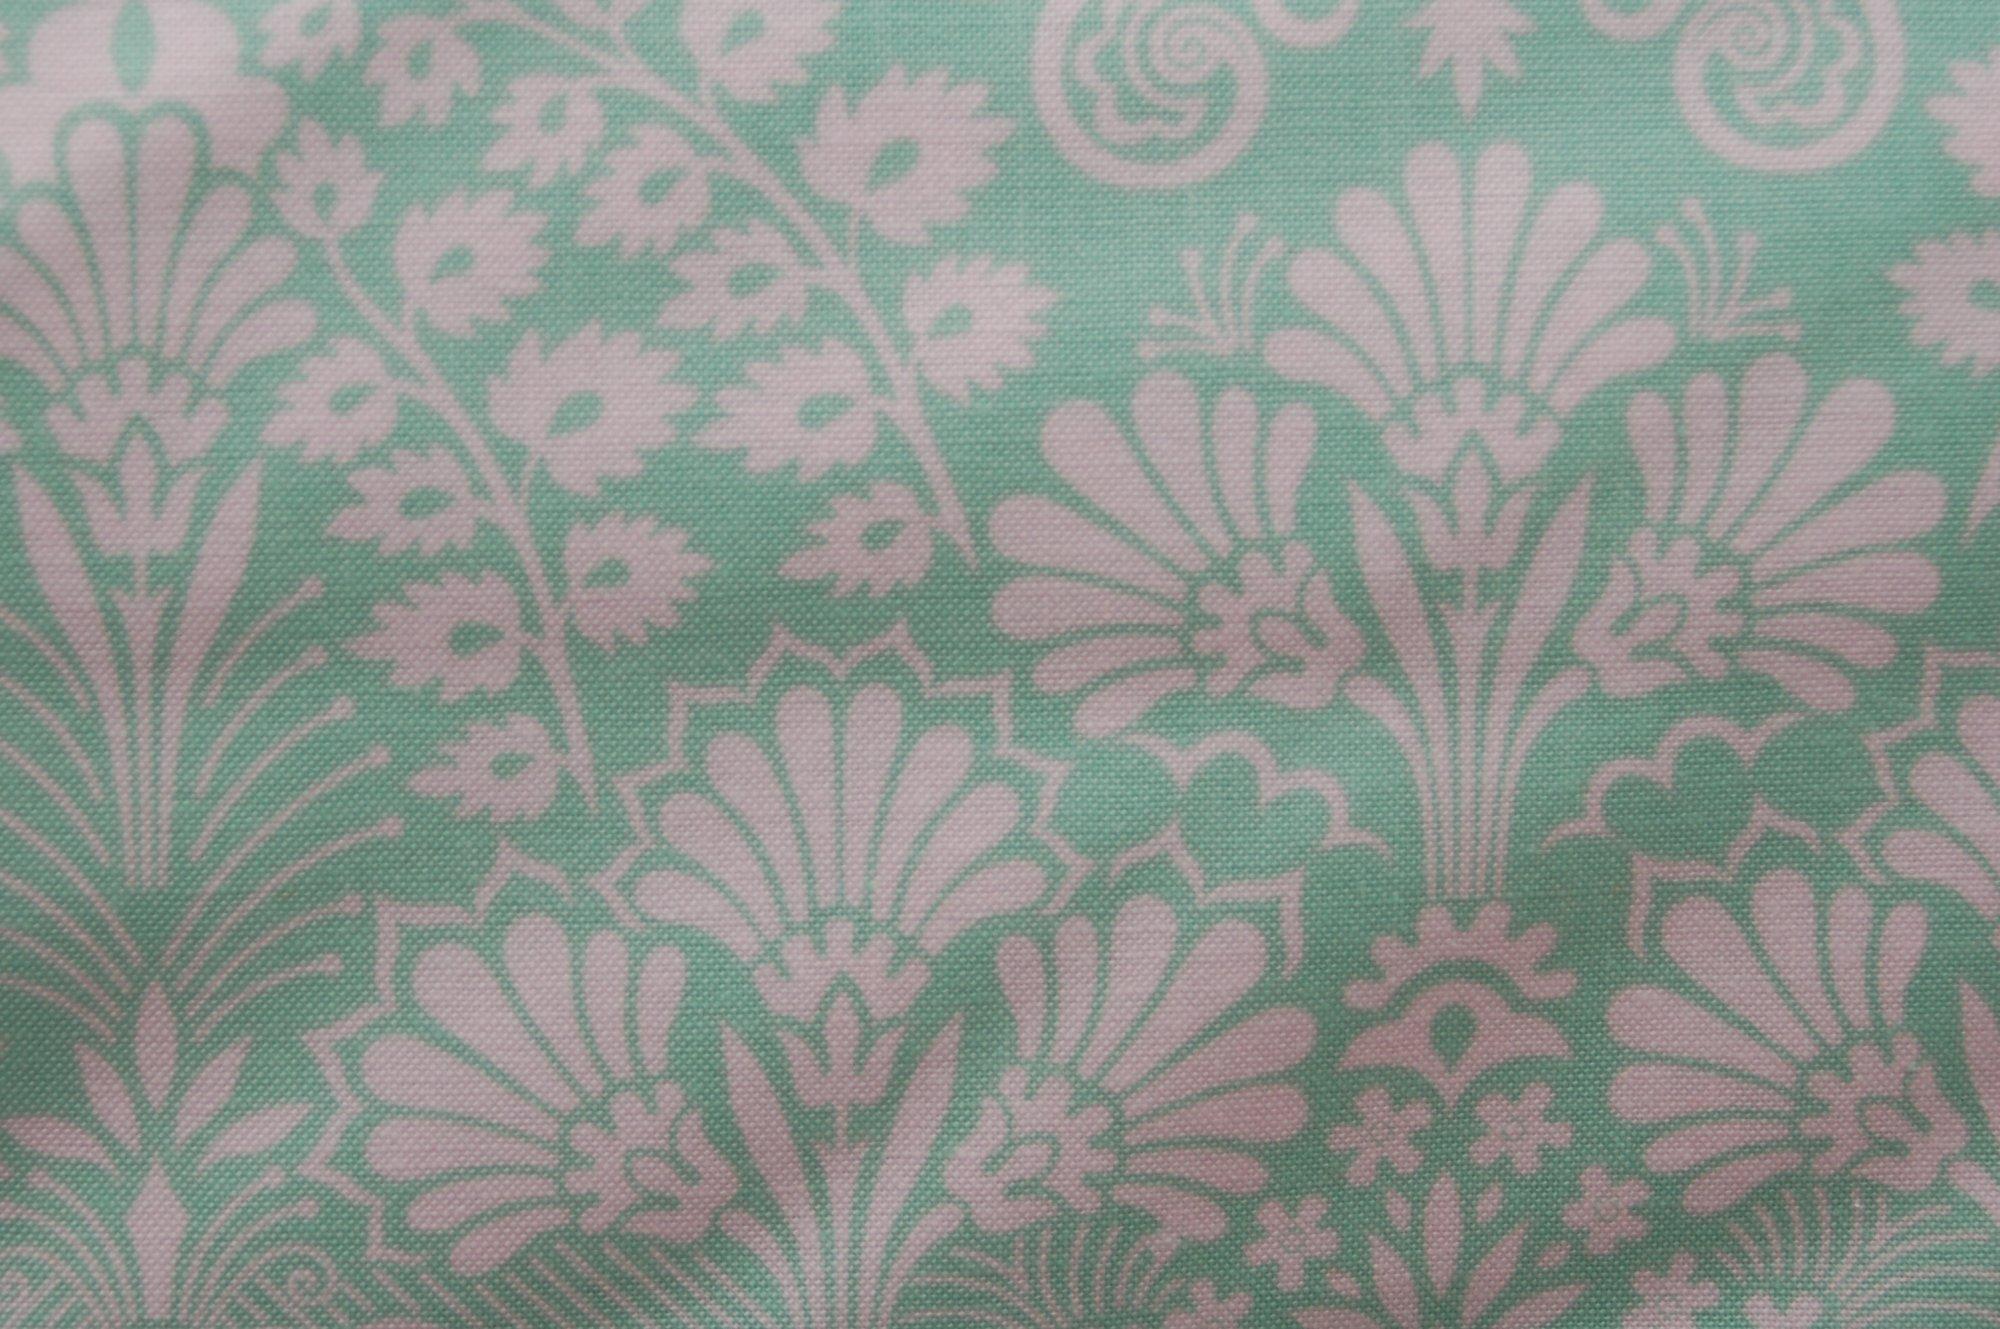 Seasons - Wild Flowers from Anna Davis for Blend Fabrics